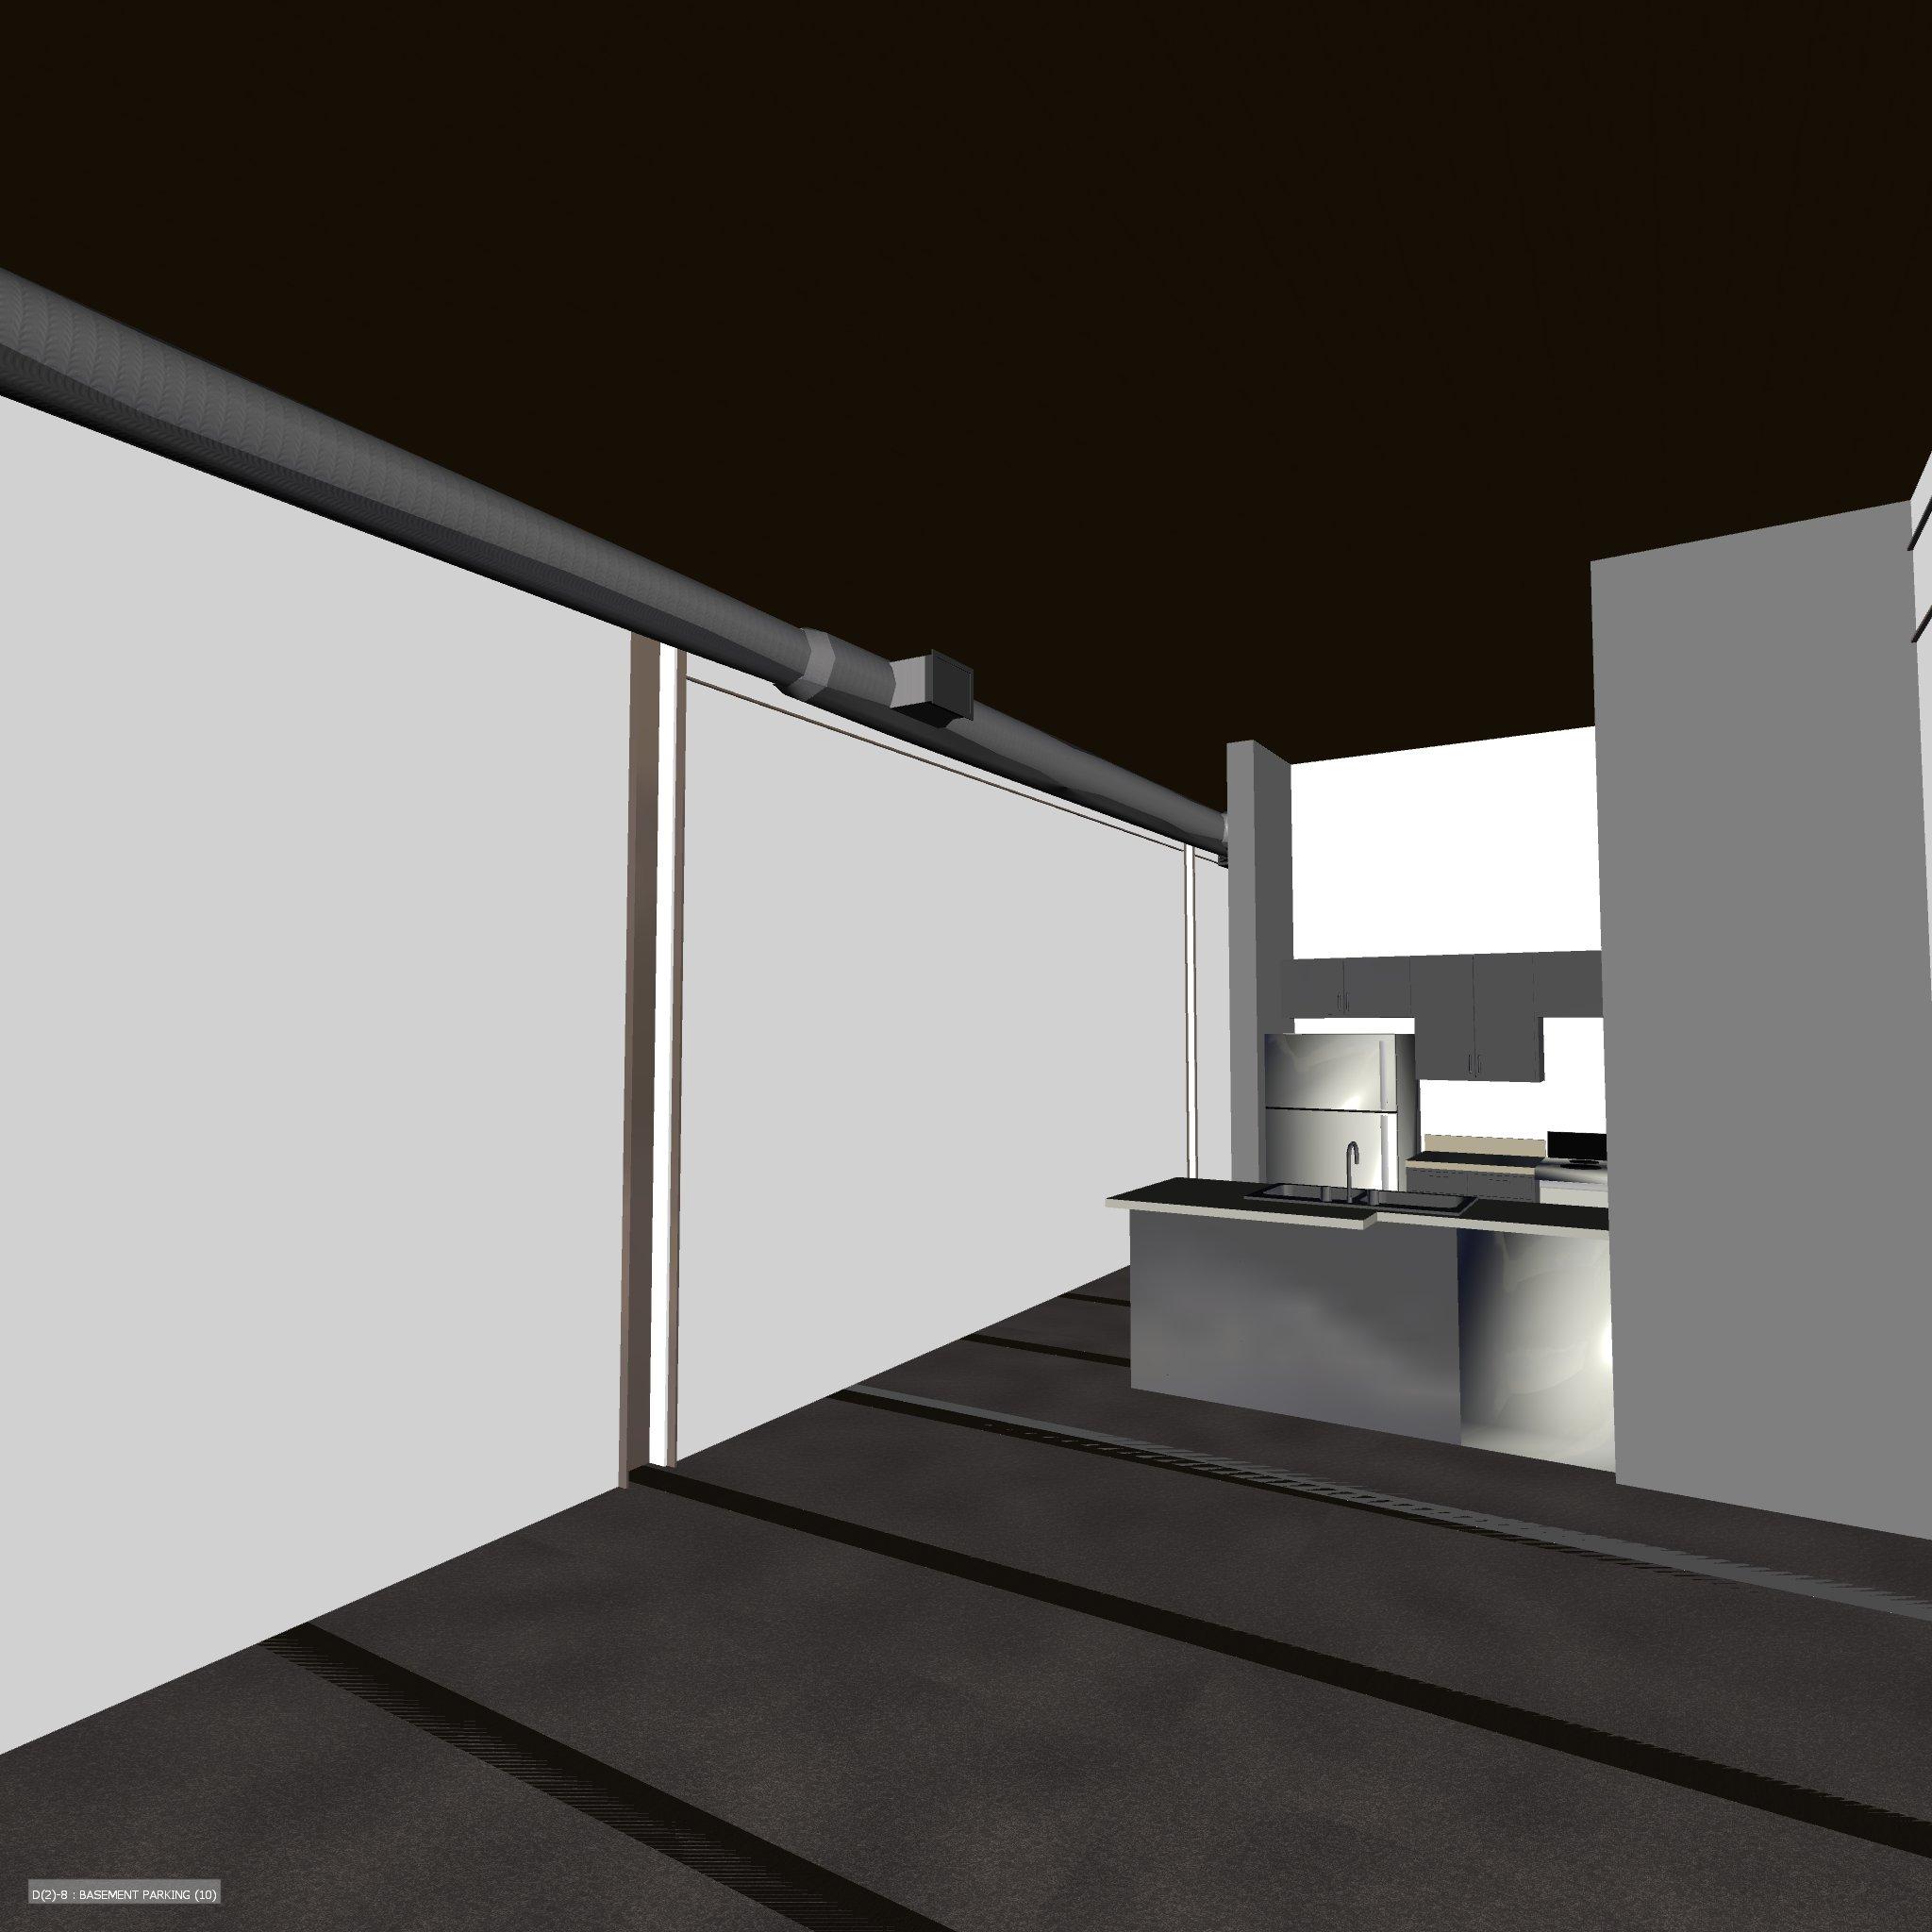 Meadow Woods Apartments: Barham, Cain, Mynatt, Inc.: Revit And Building Information